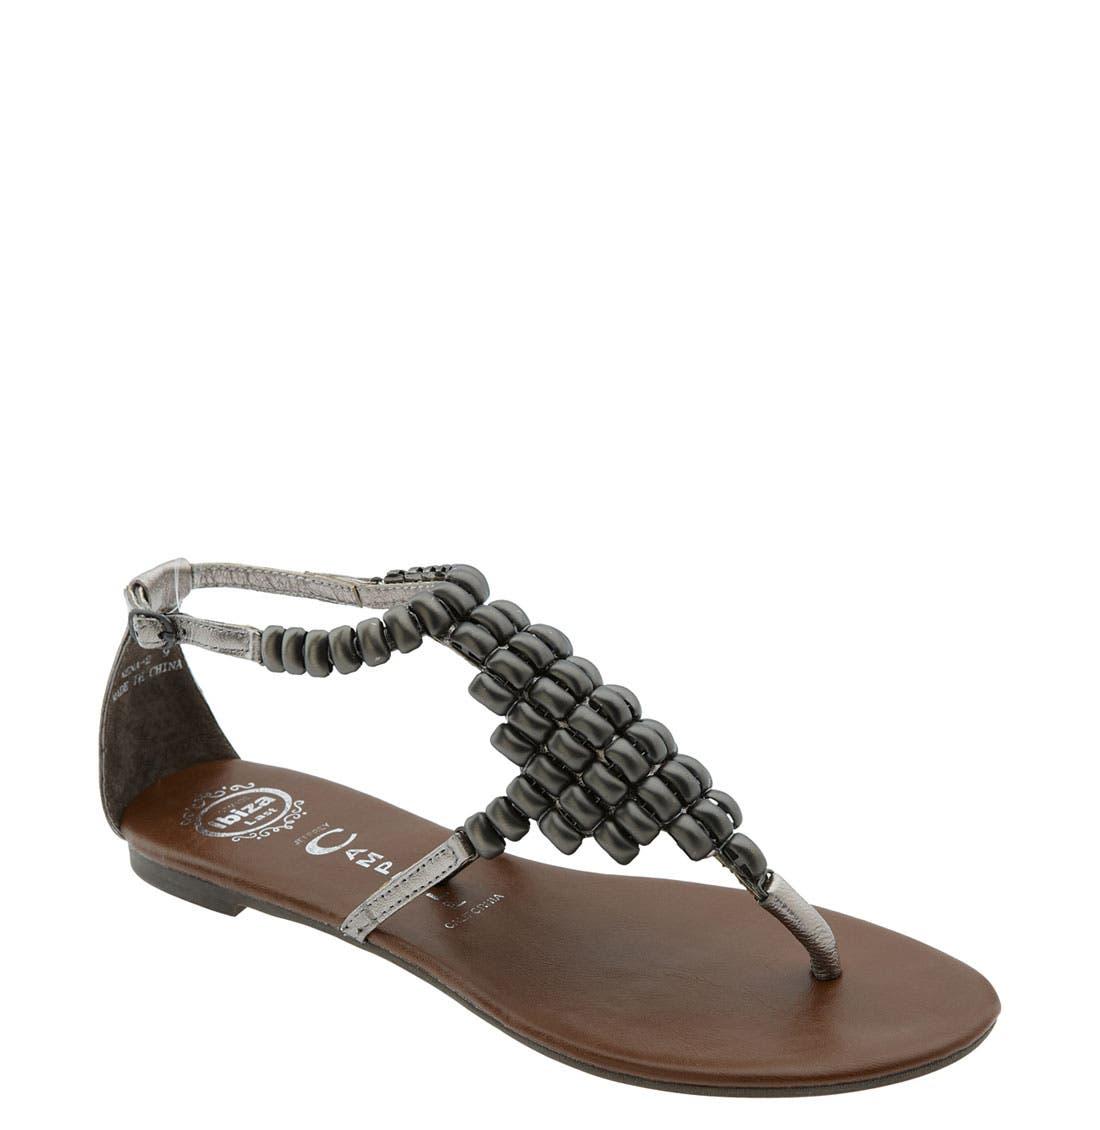 Main Image - Jeffrey Campbell 'Nena 2' Sandal